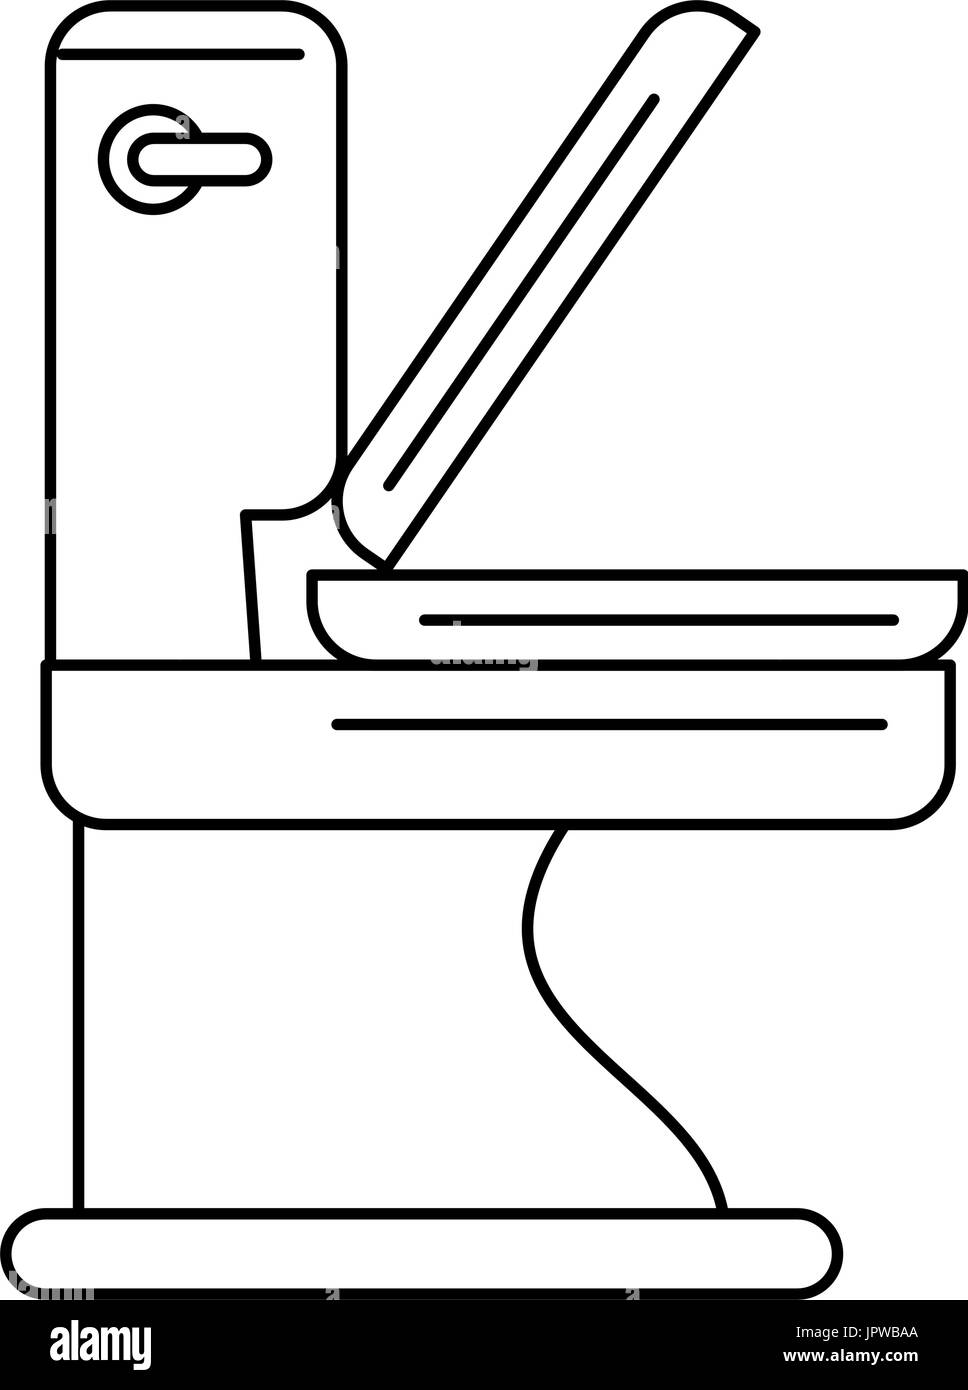 toilet bathware item icon image Stock Vector Art & Illustration ...